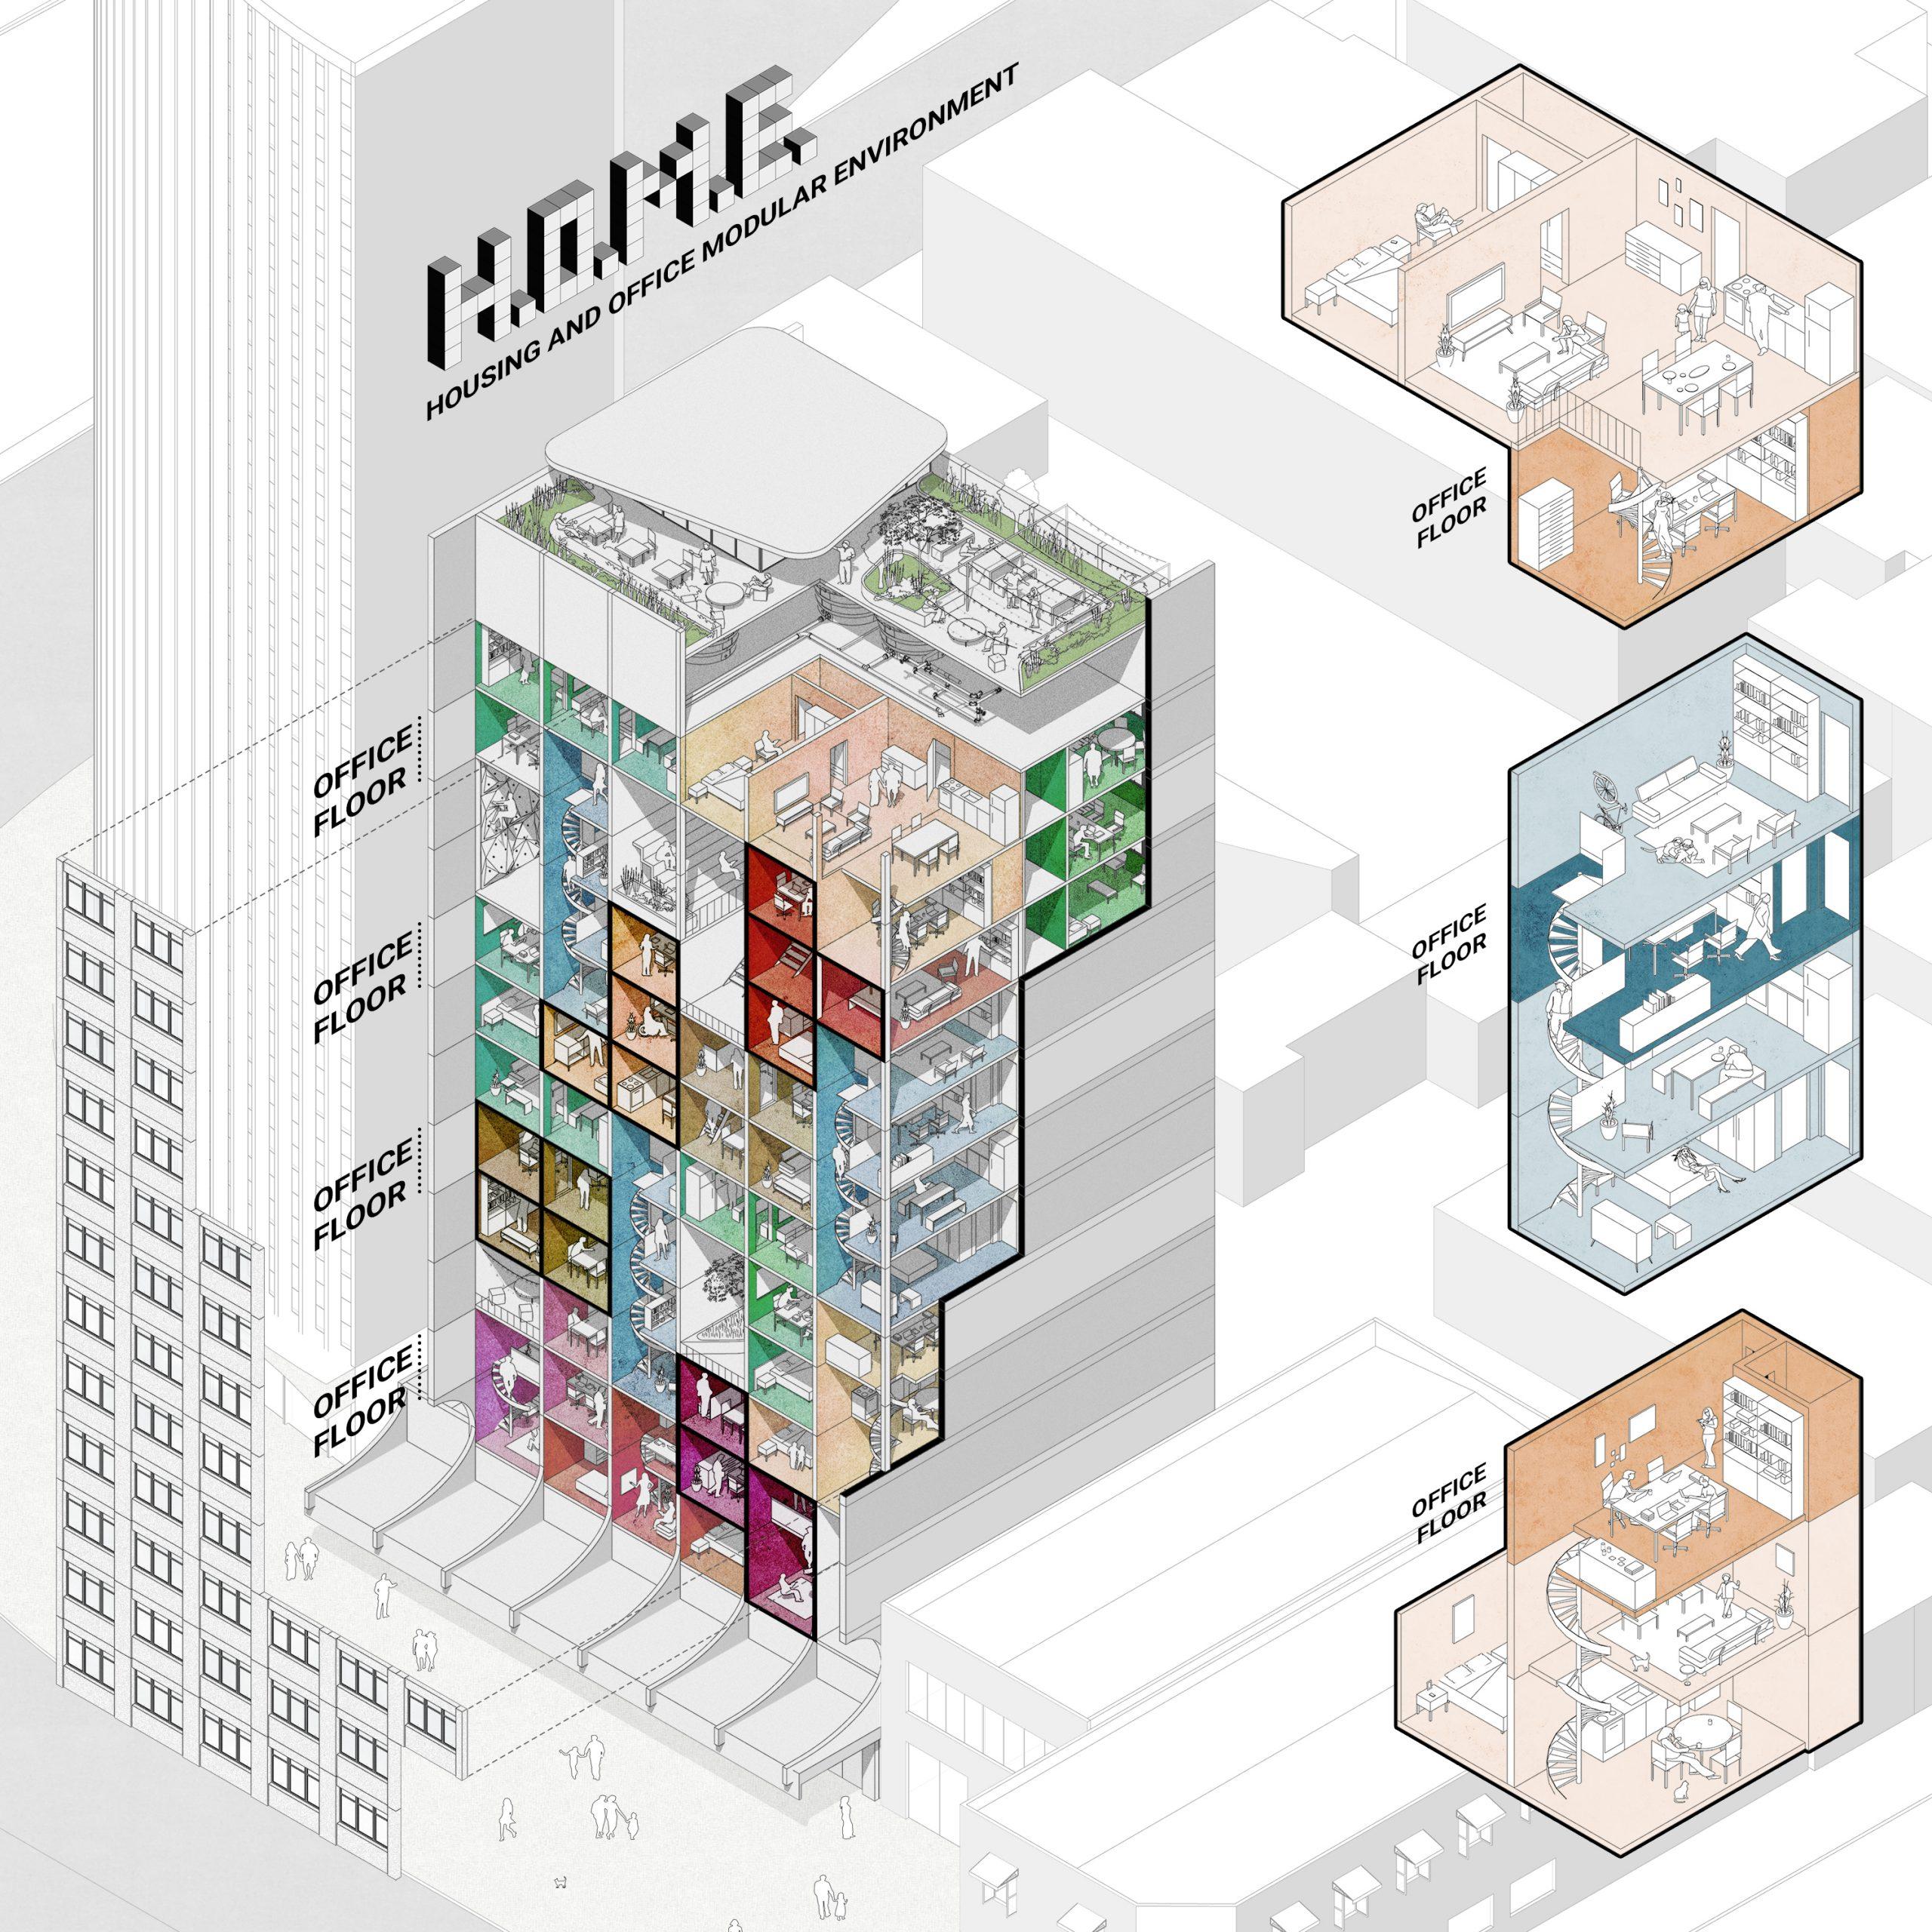 H.O.M.E. – Housing and Office Modular Environment Live-where-you-work-where-you-live.- by Ricardo Goncalves, Matheus Marques, Luis Favilla & Rolando Figueiredo